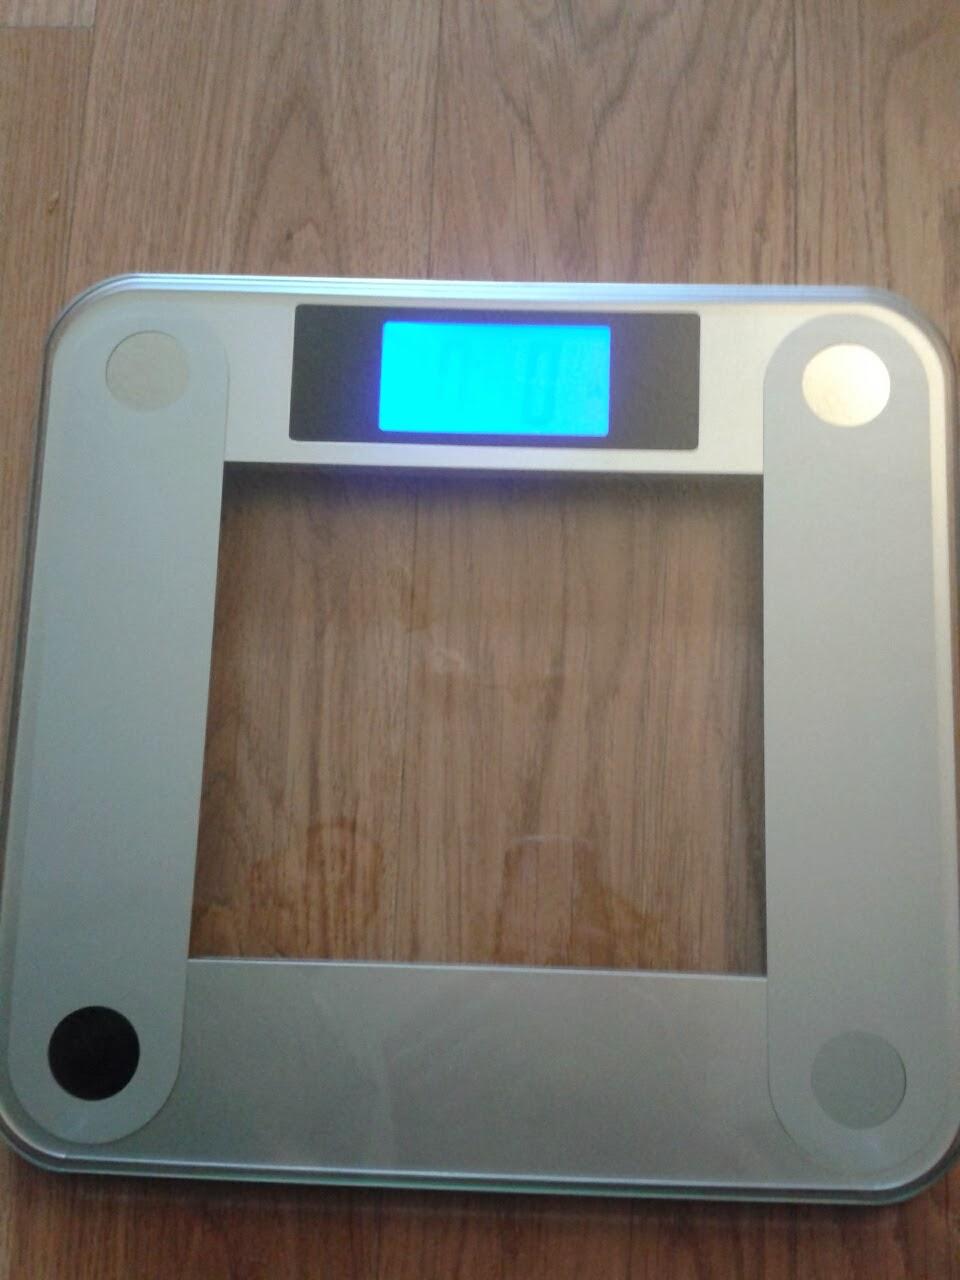 Eatsmart precision digital bathroom scale review - Precision Ii Digital Bathroom Scale Precision Digital Bathroom Scale Have Suspect That Also Quite Effective